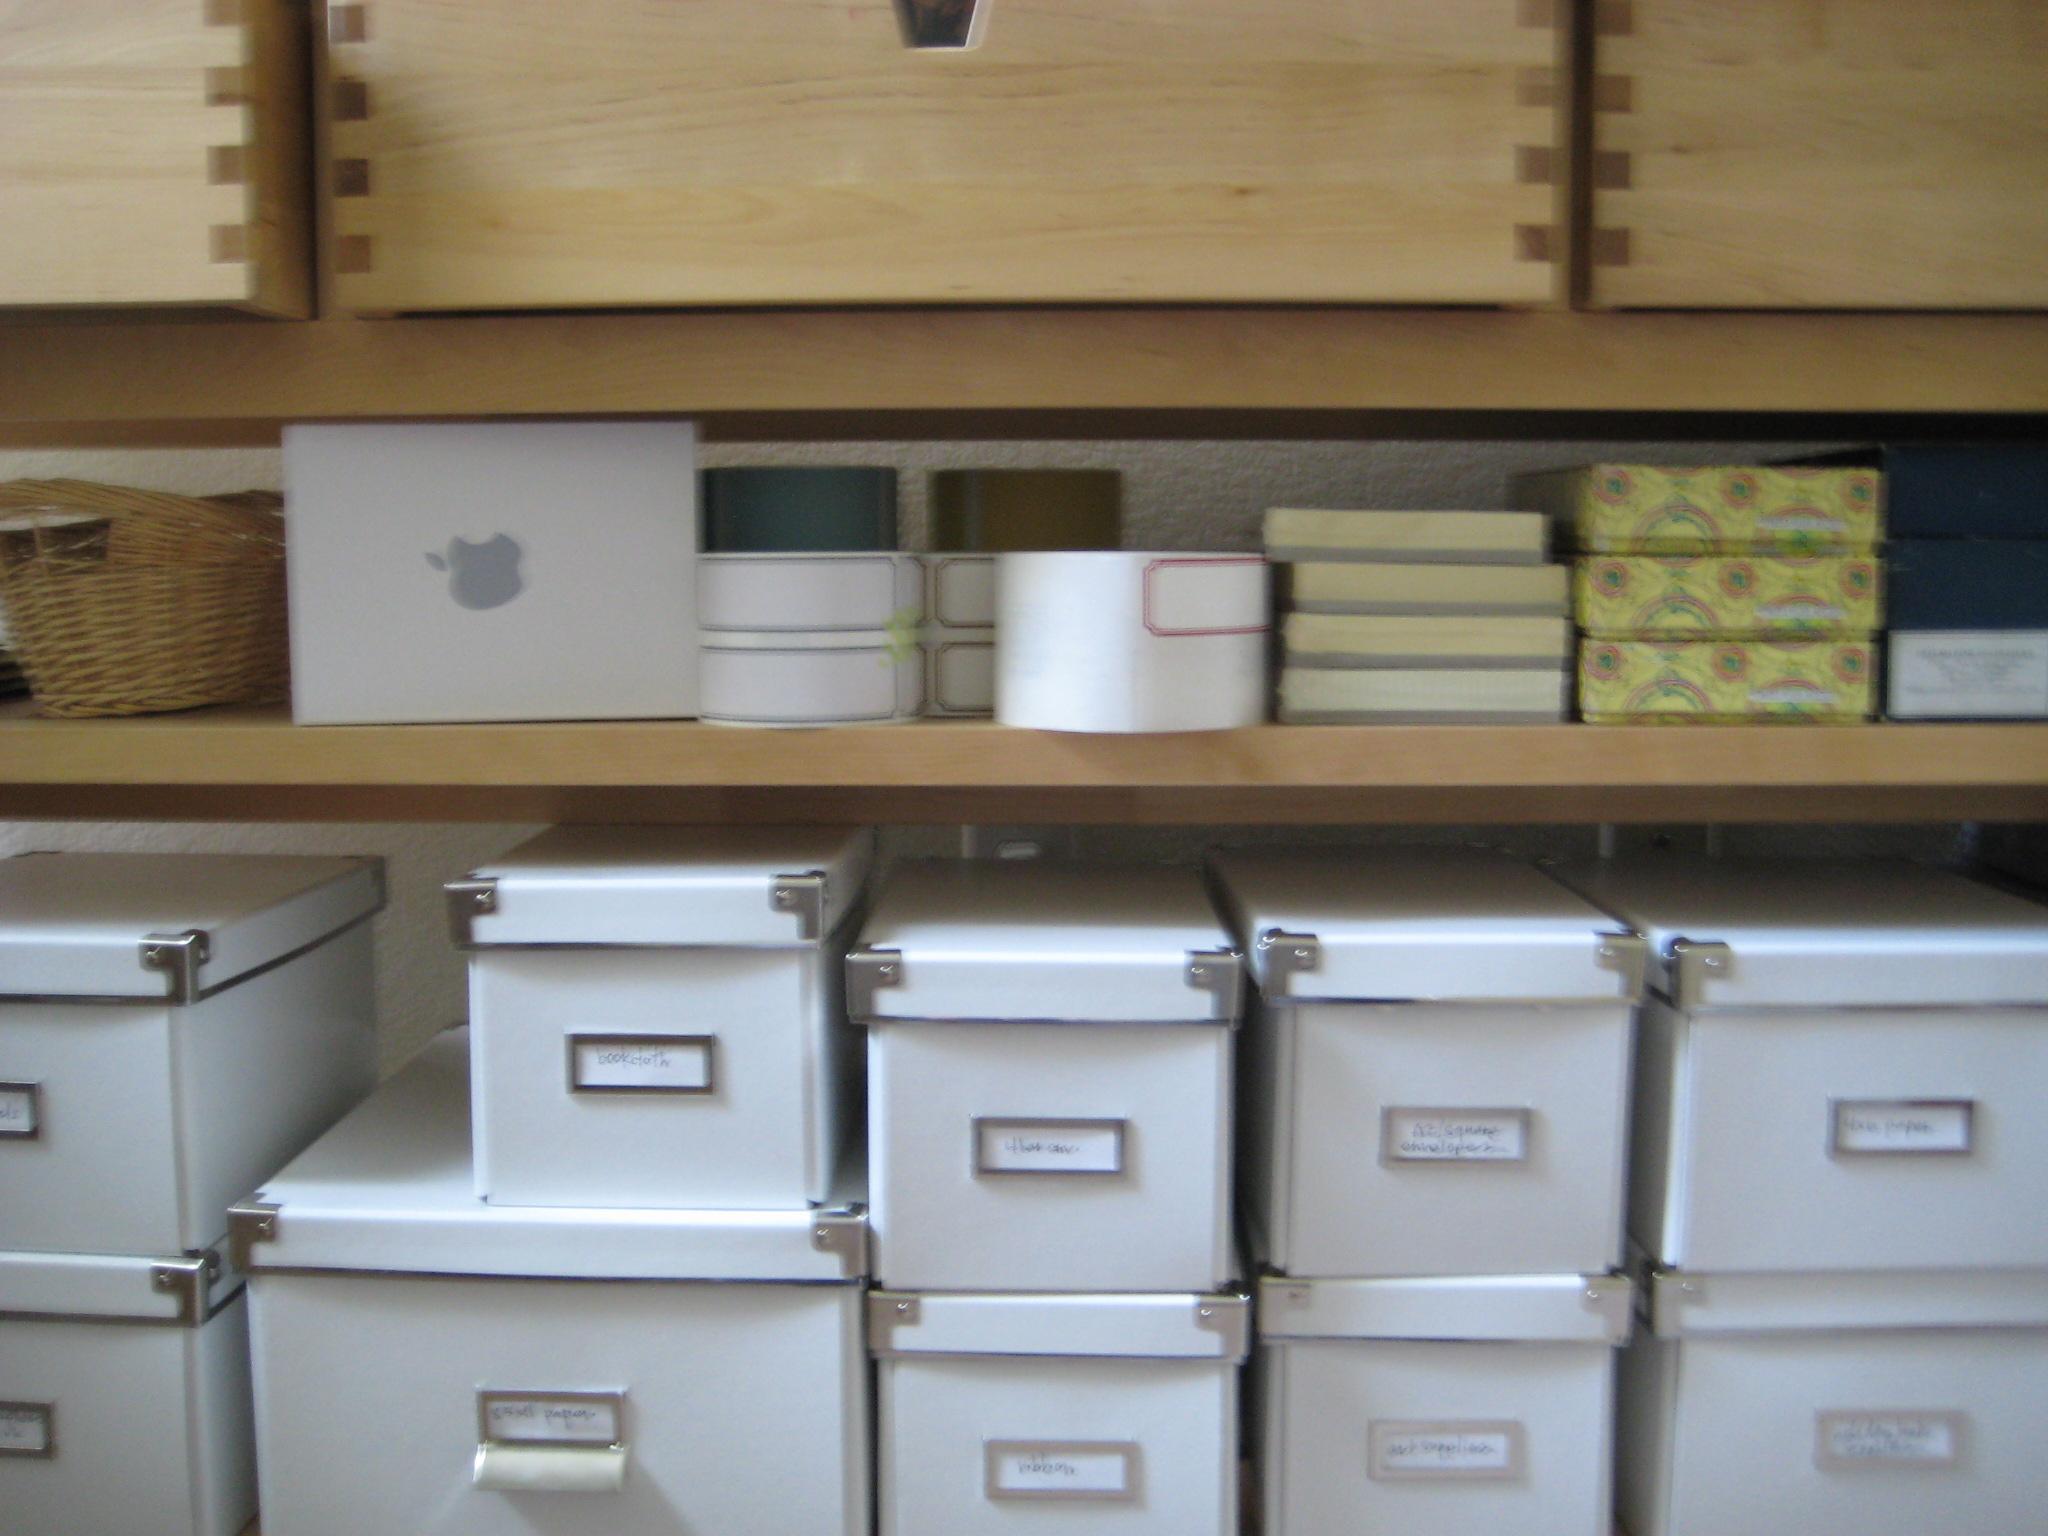 ikea office storage boxes. Ikea Office Storage. Storage Boxes K